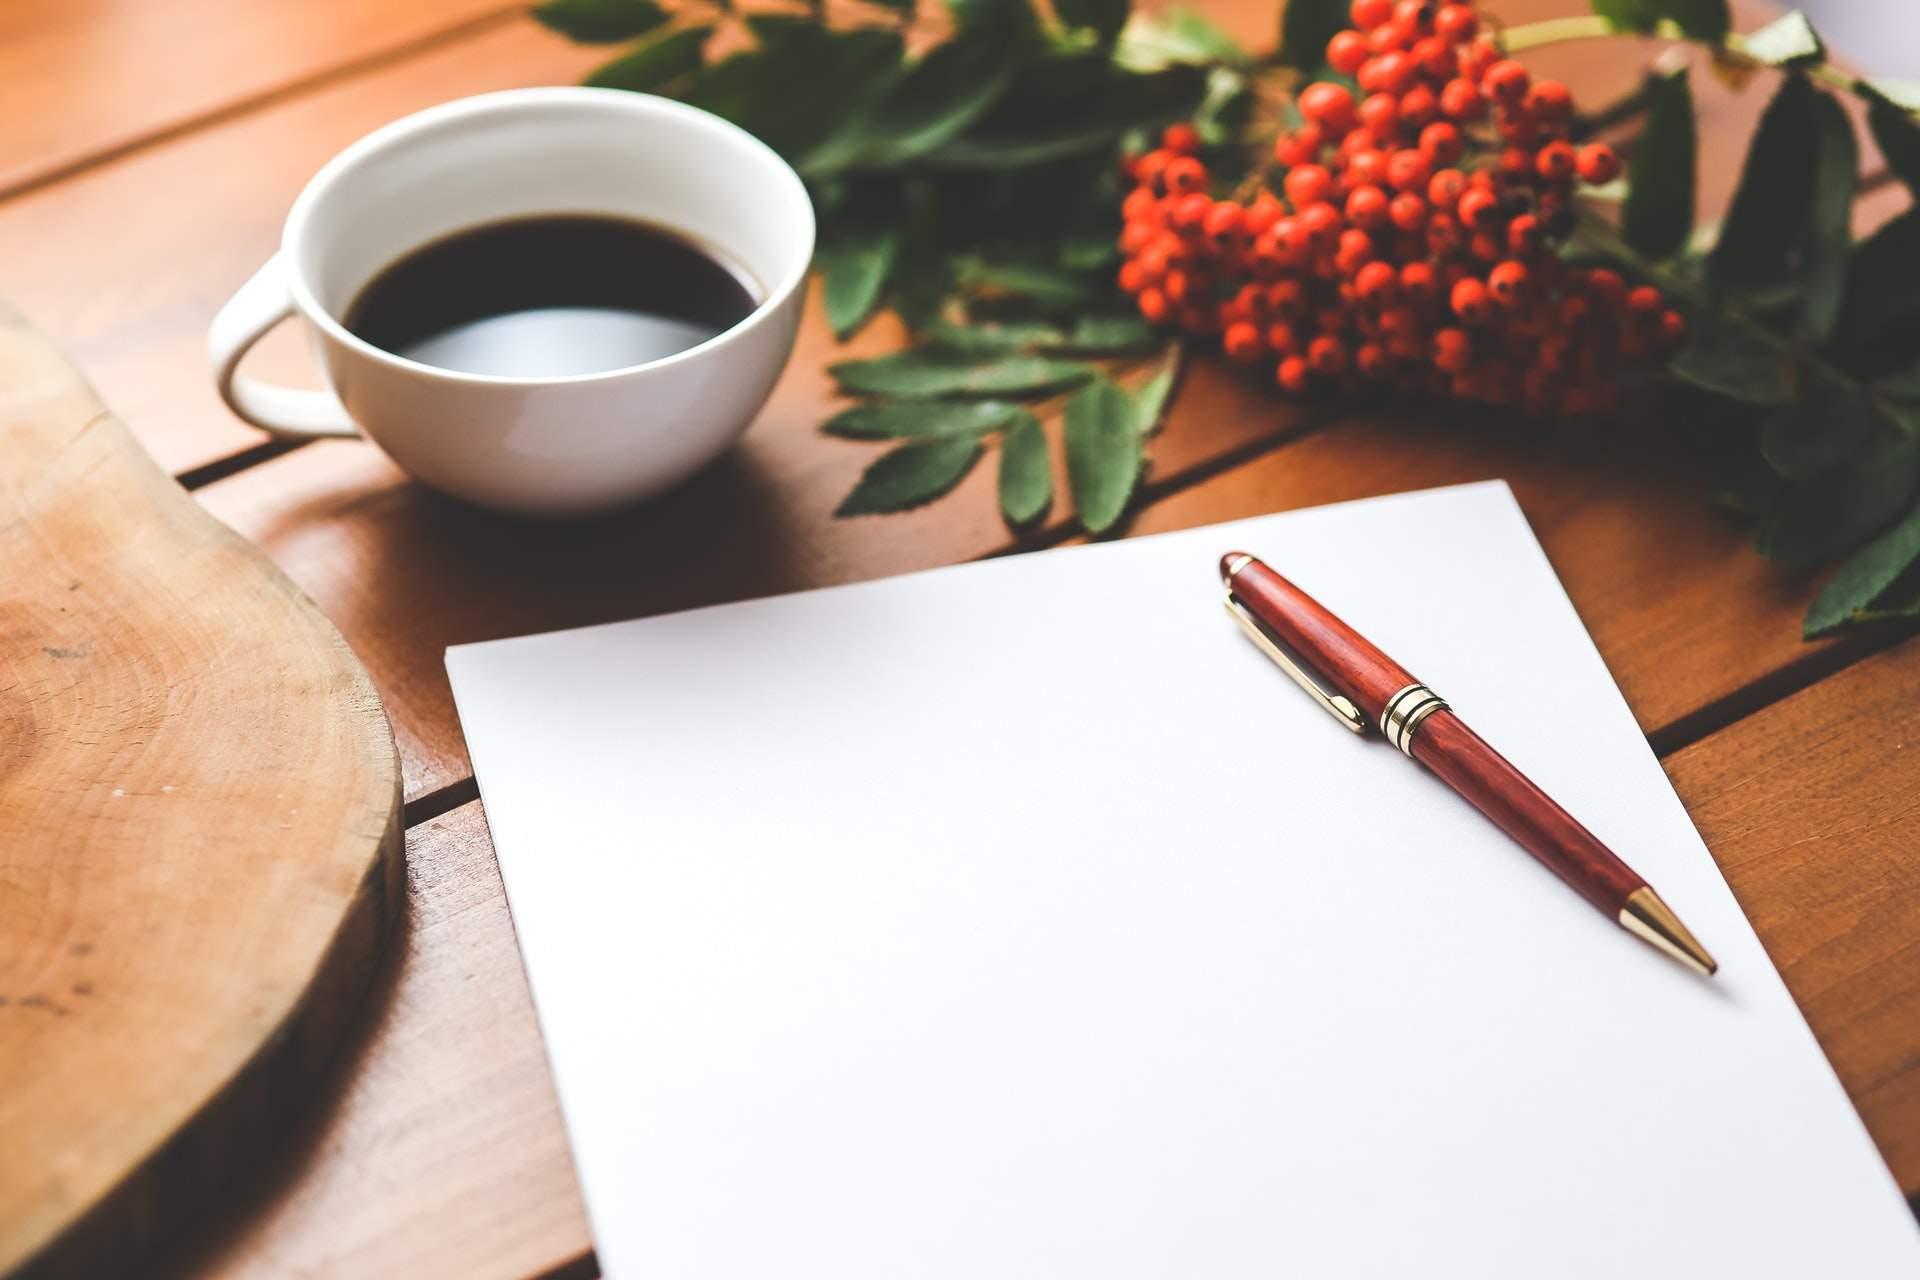 coffee-cup-desk-pen-1